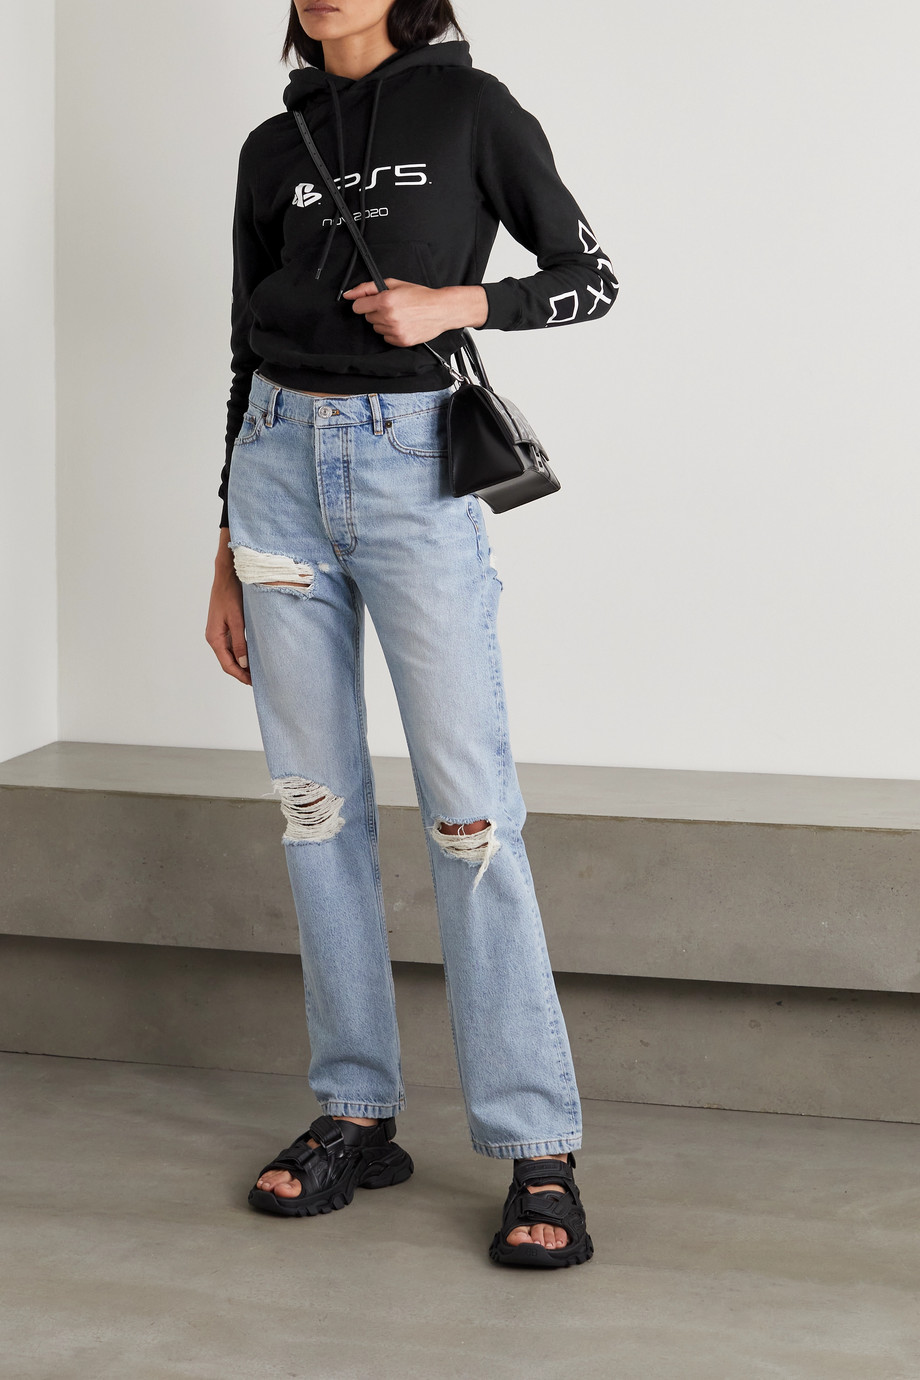 Balenciaga Sweat à capuche en jersey de coton imprimé x PlayStation